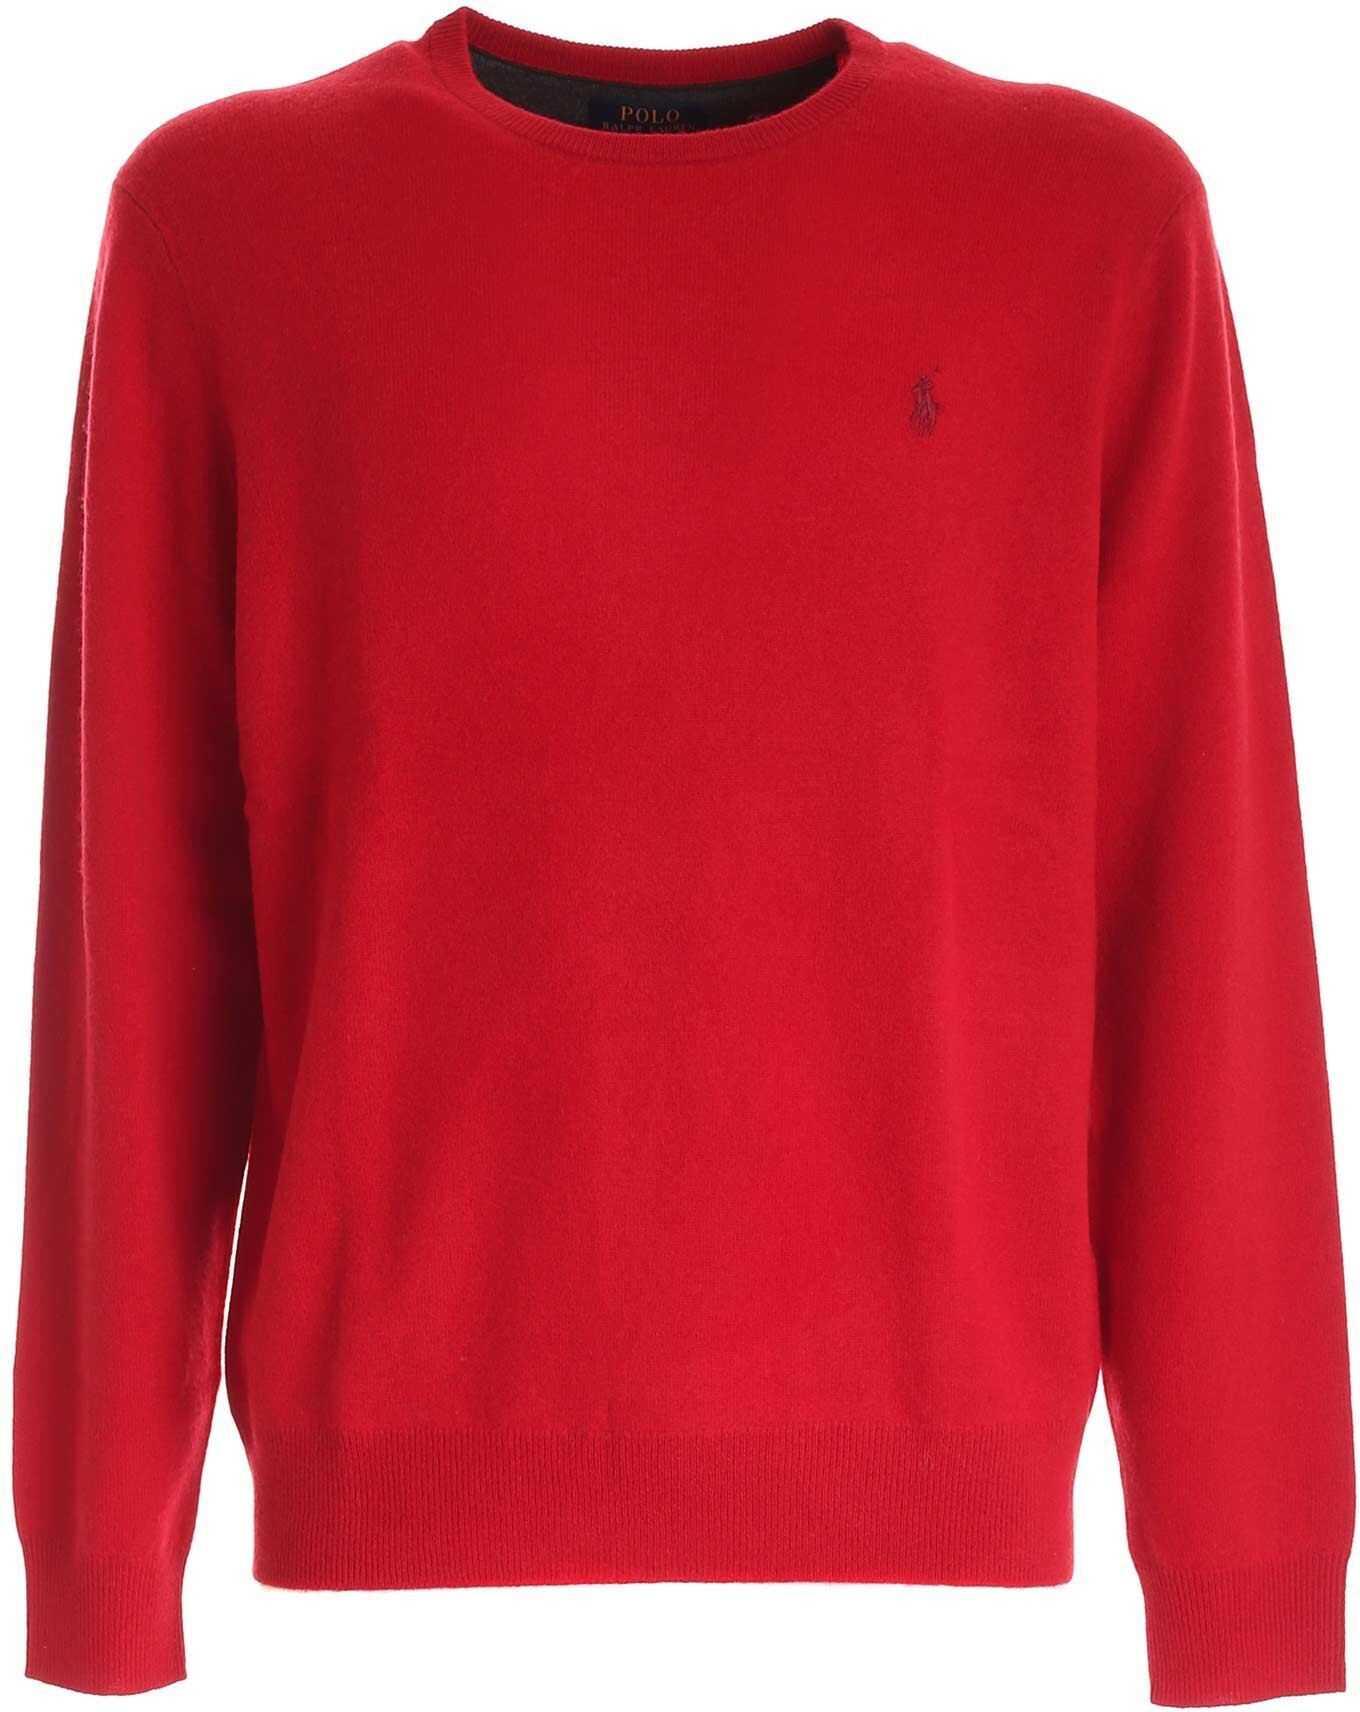 Ralph Lauren Logo Pullover In Red Red imagine